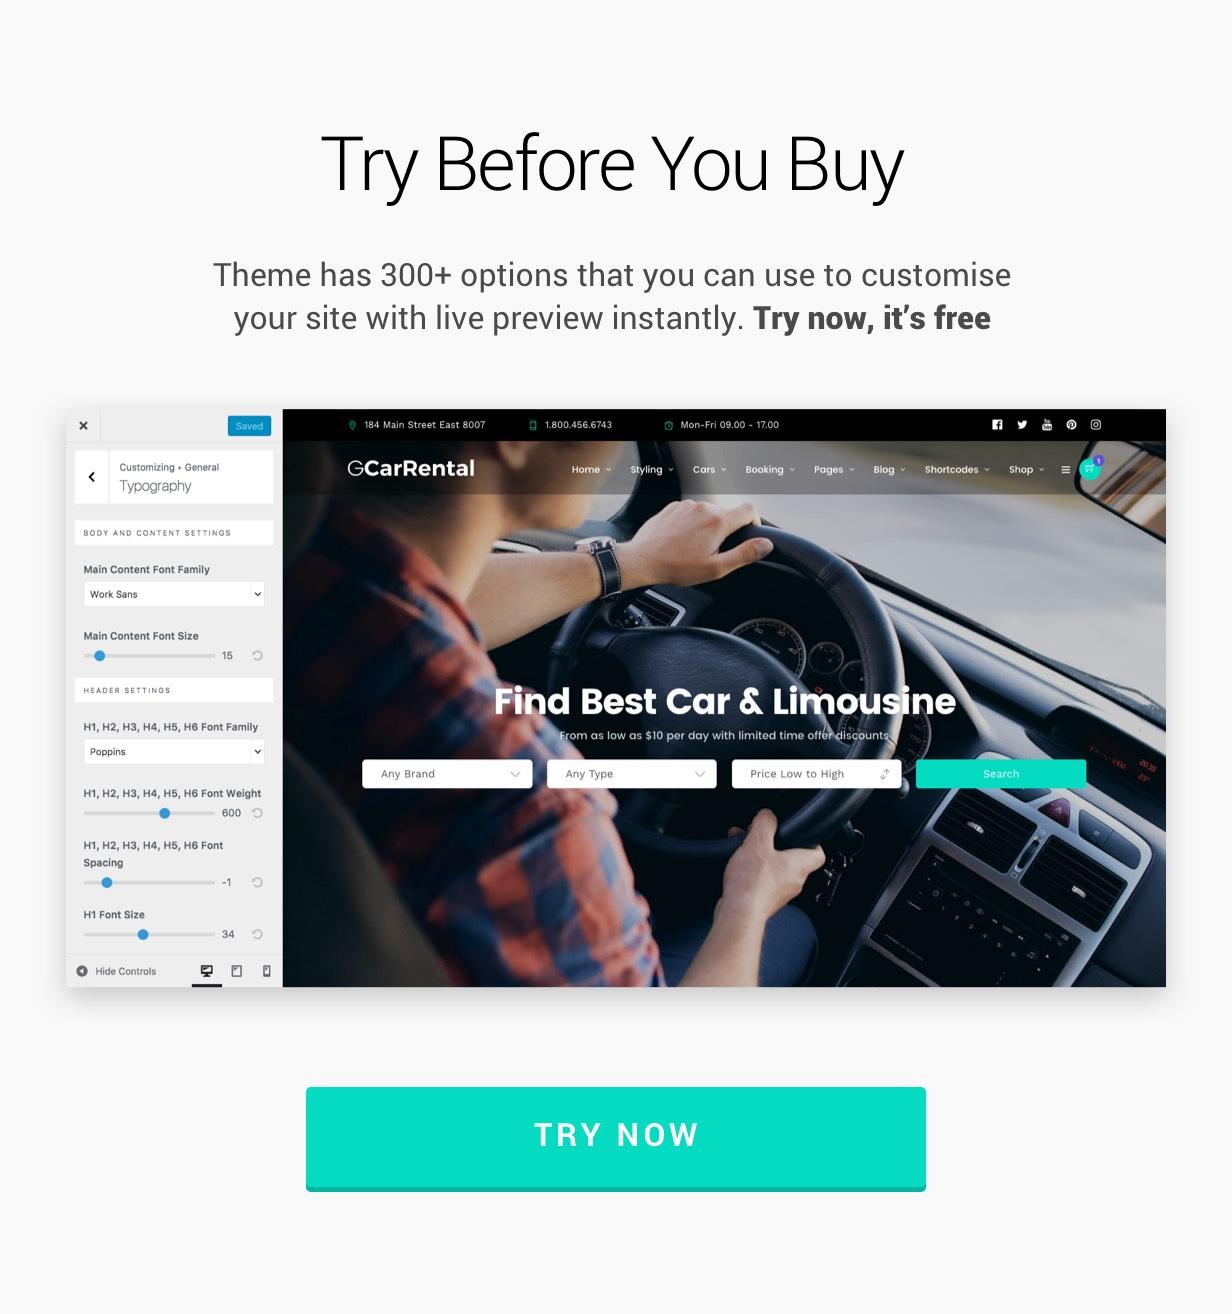 Grand Car Rental Limousine Car Rental Wordpress By Themegoods